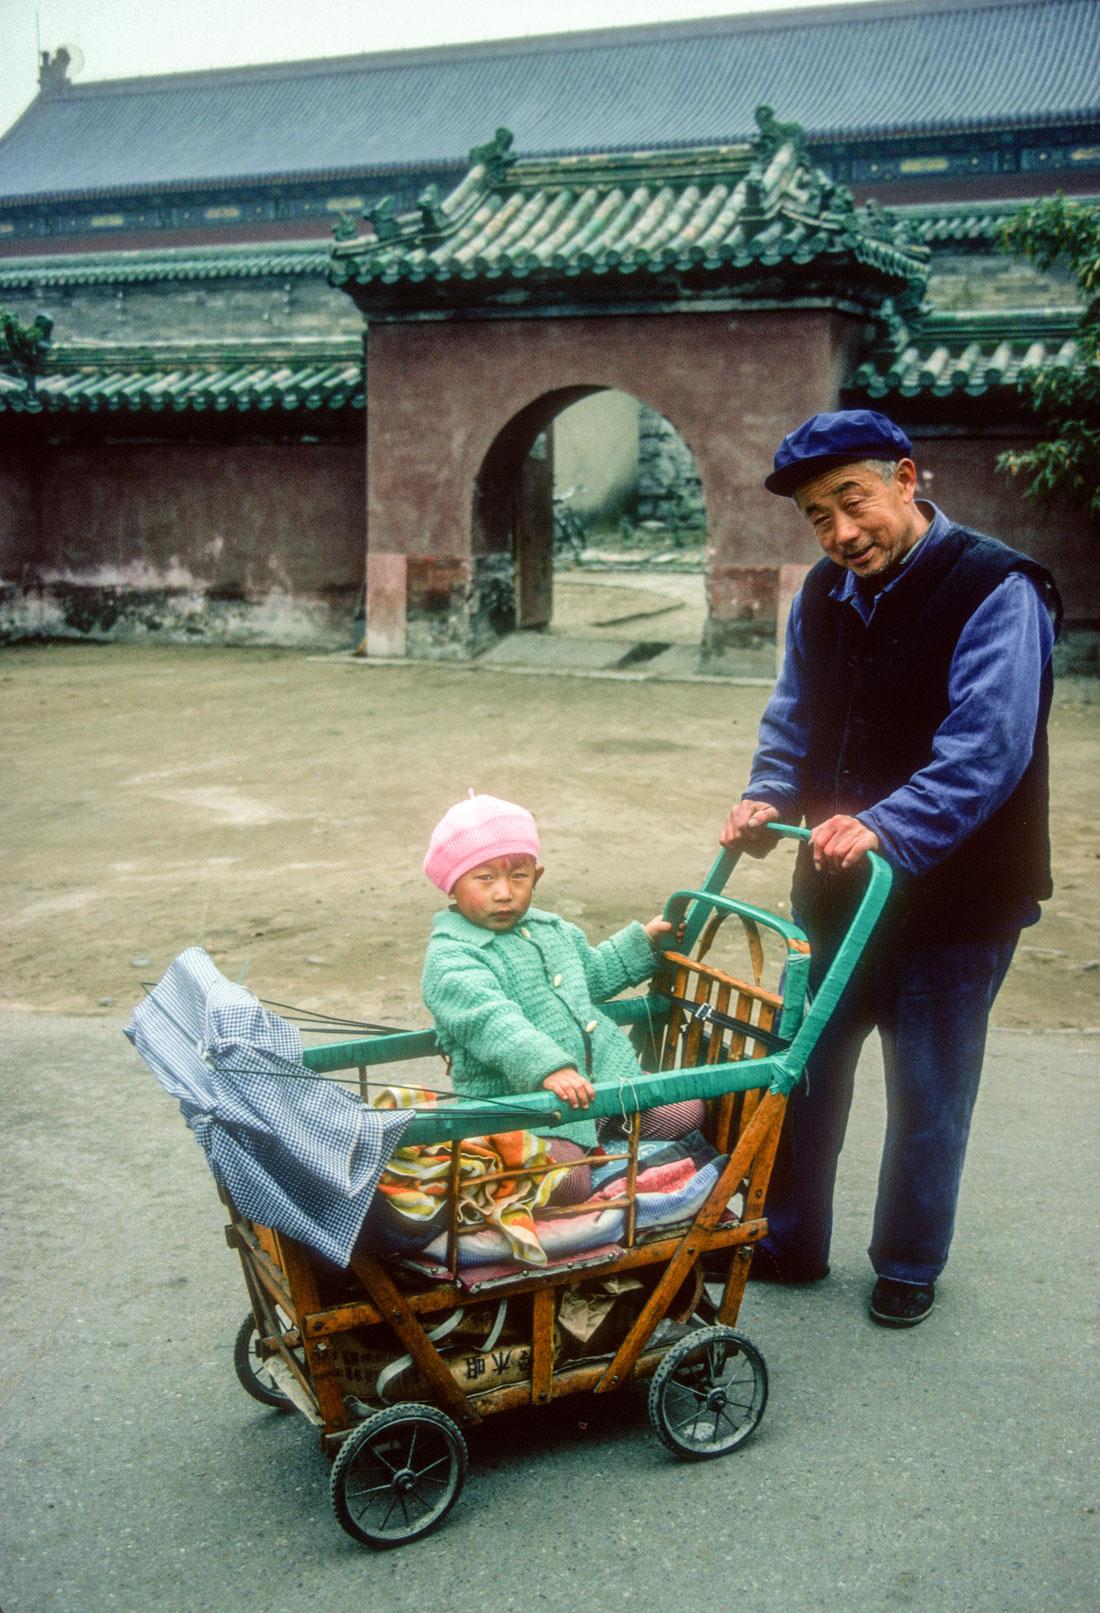 Grandfather and grand child, Beijing, China